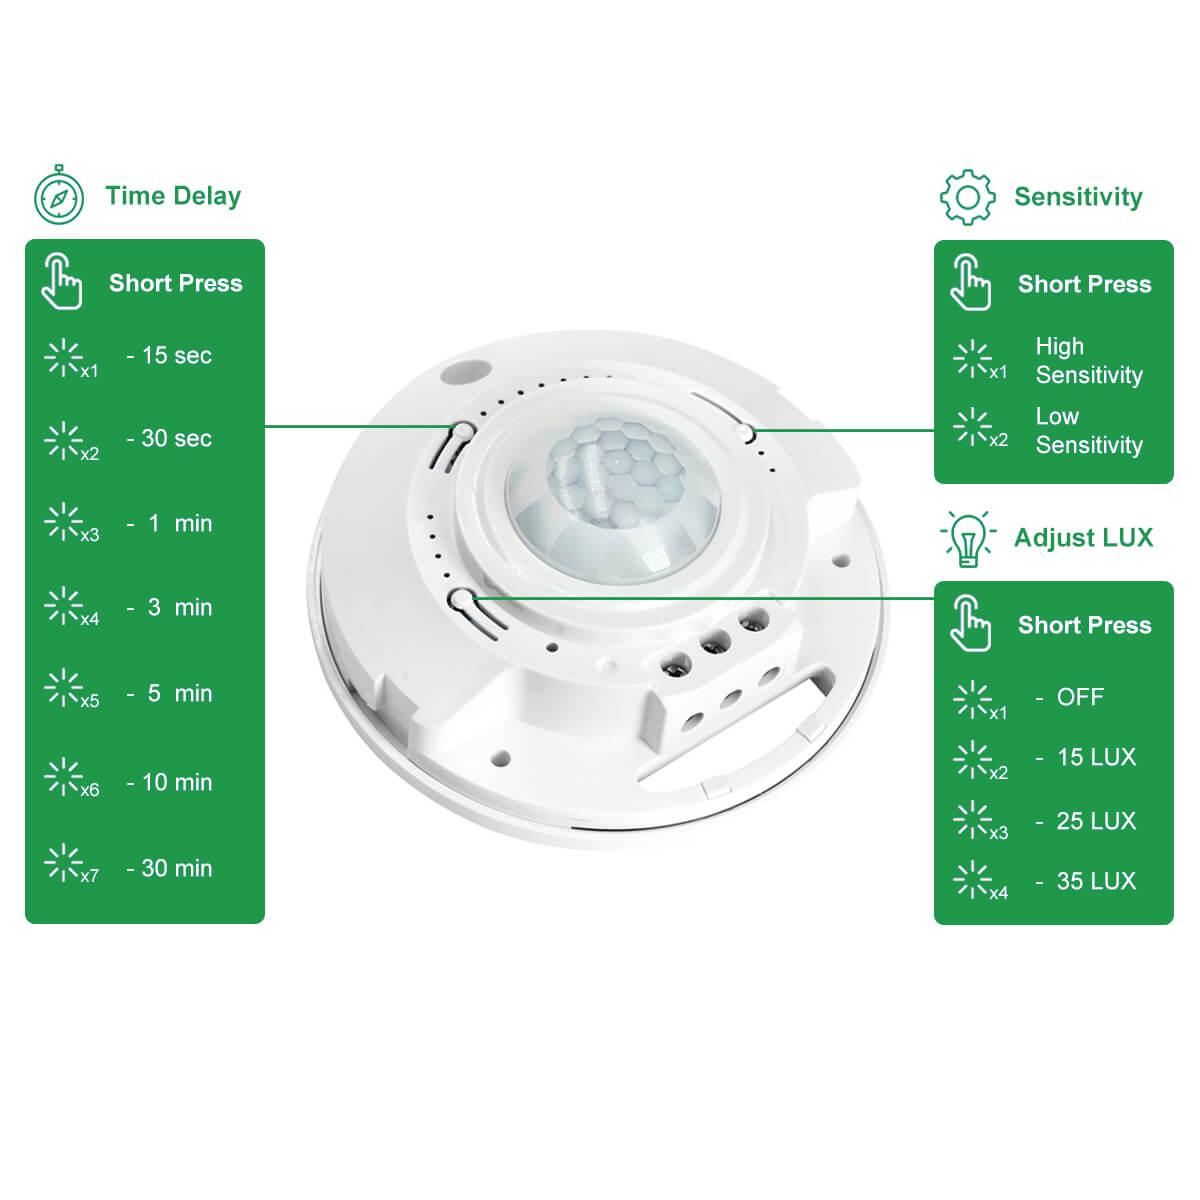 rz036 motion sensor switch manual instruction